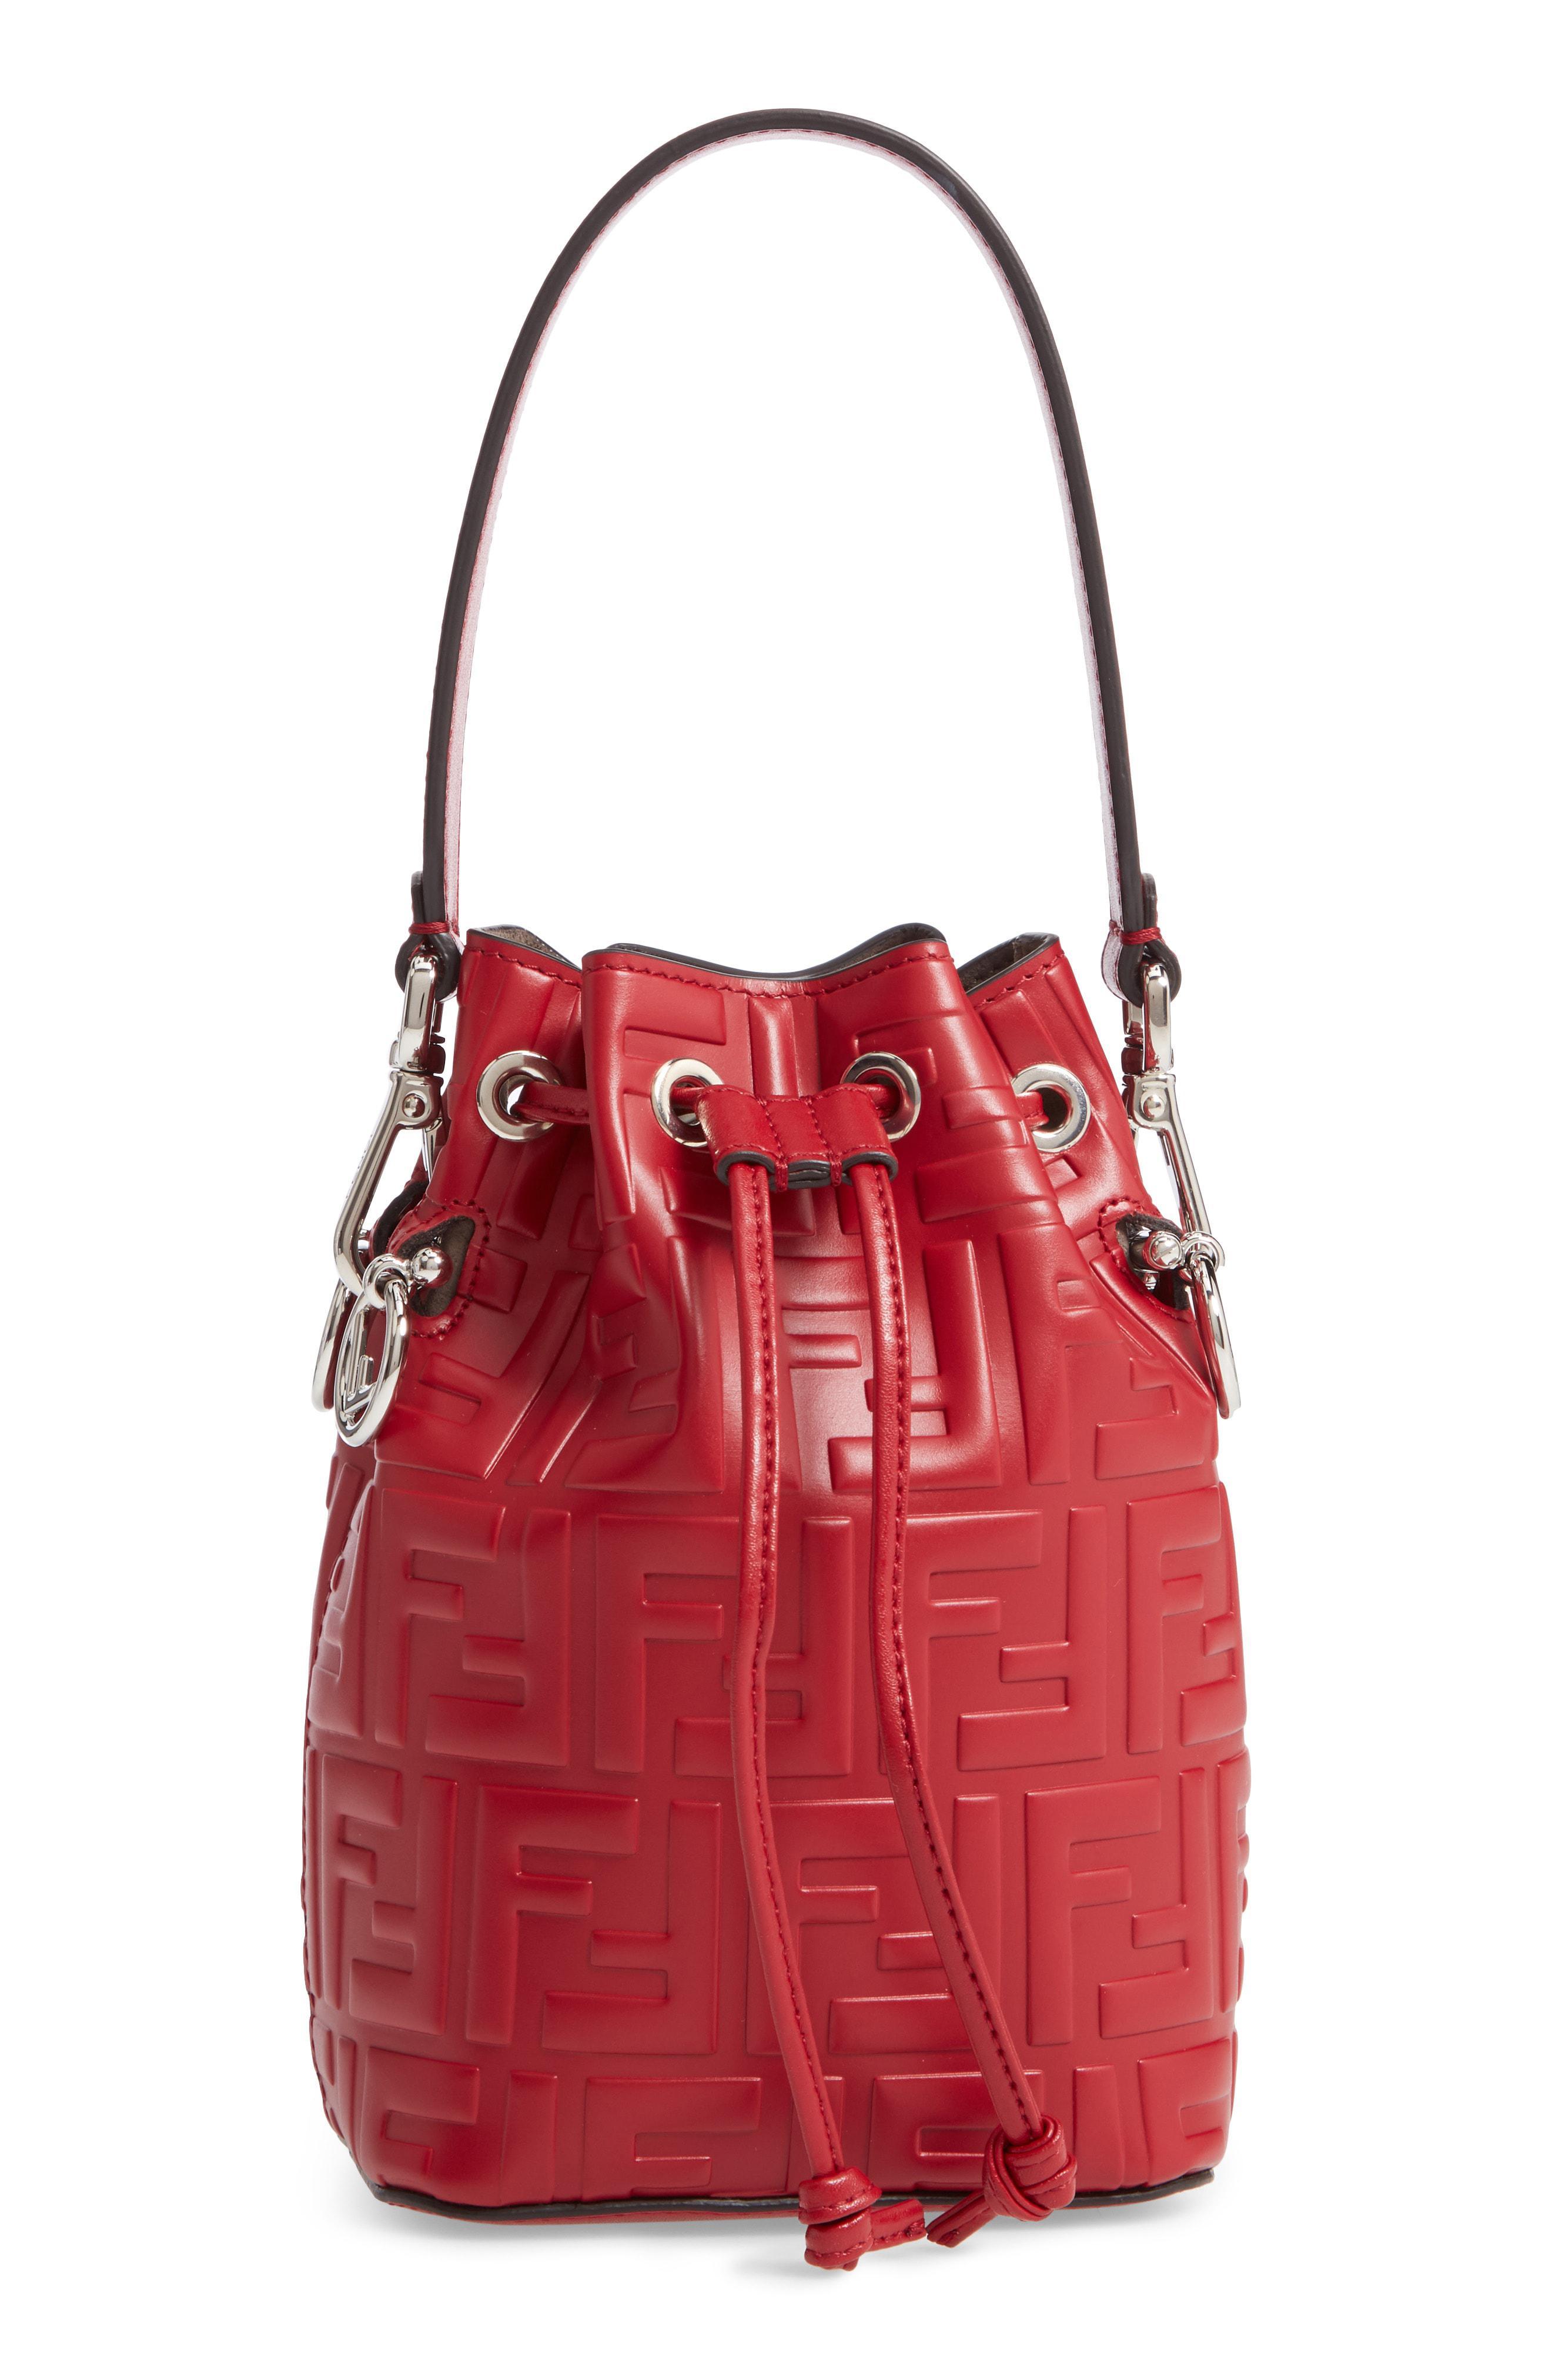 b47532715f Lyst - Fendi Mon Tresor Mini Leather Bucket Bag in Red